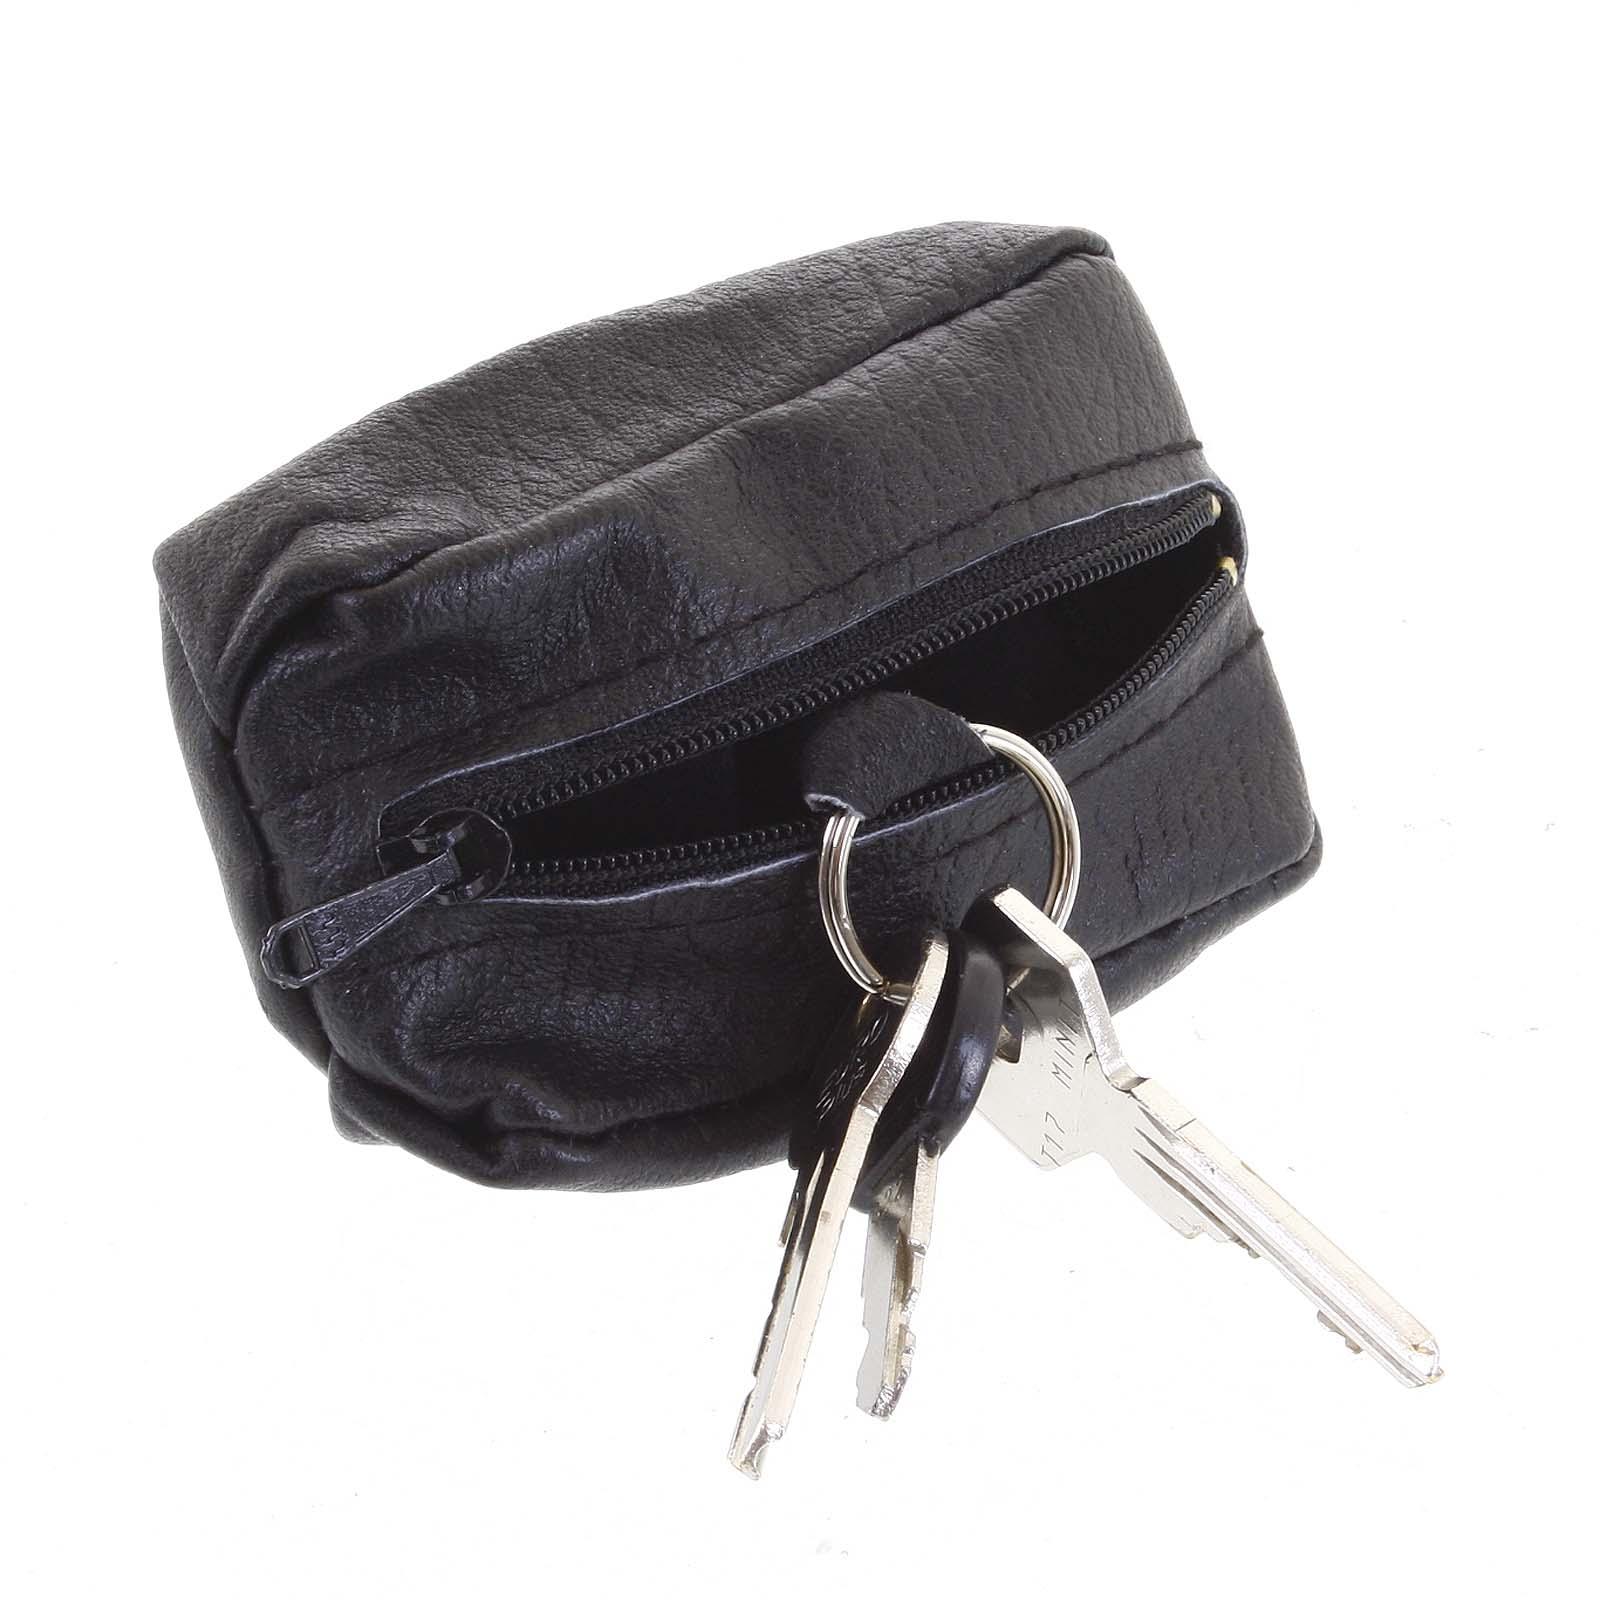 Kožená klíčenka SendiDesign černá - KL002 Wide